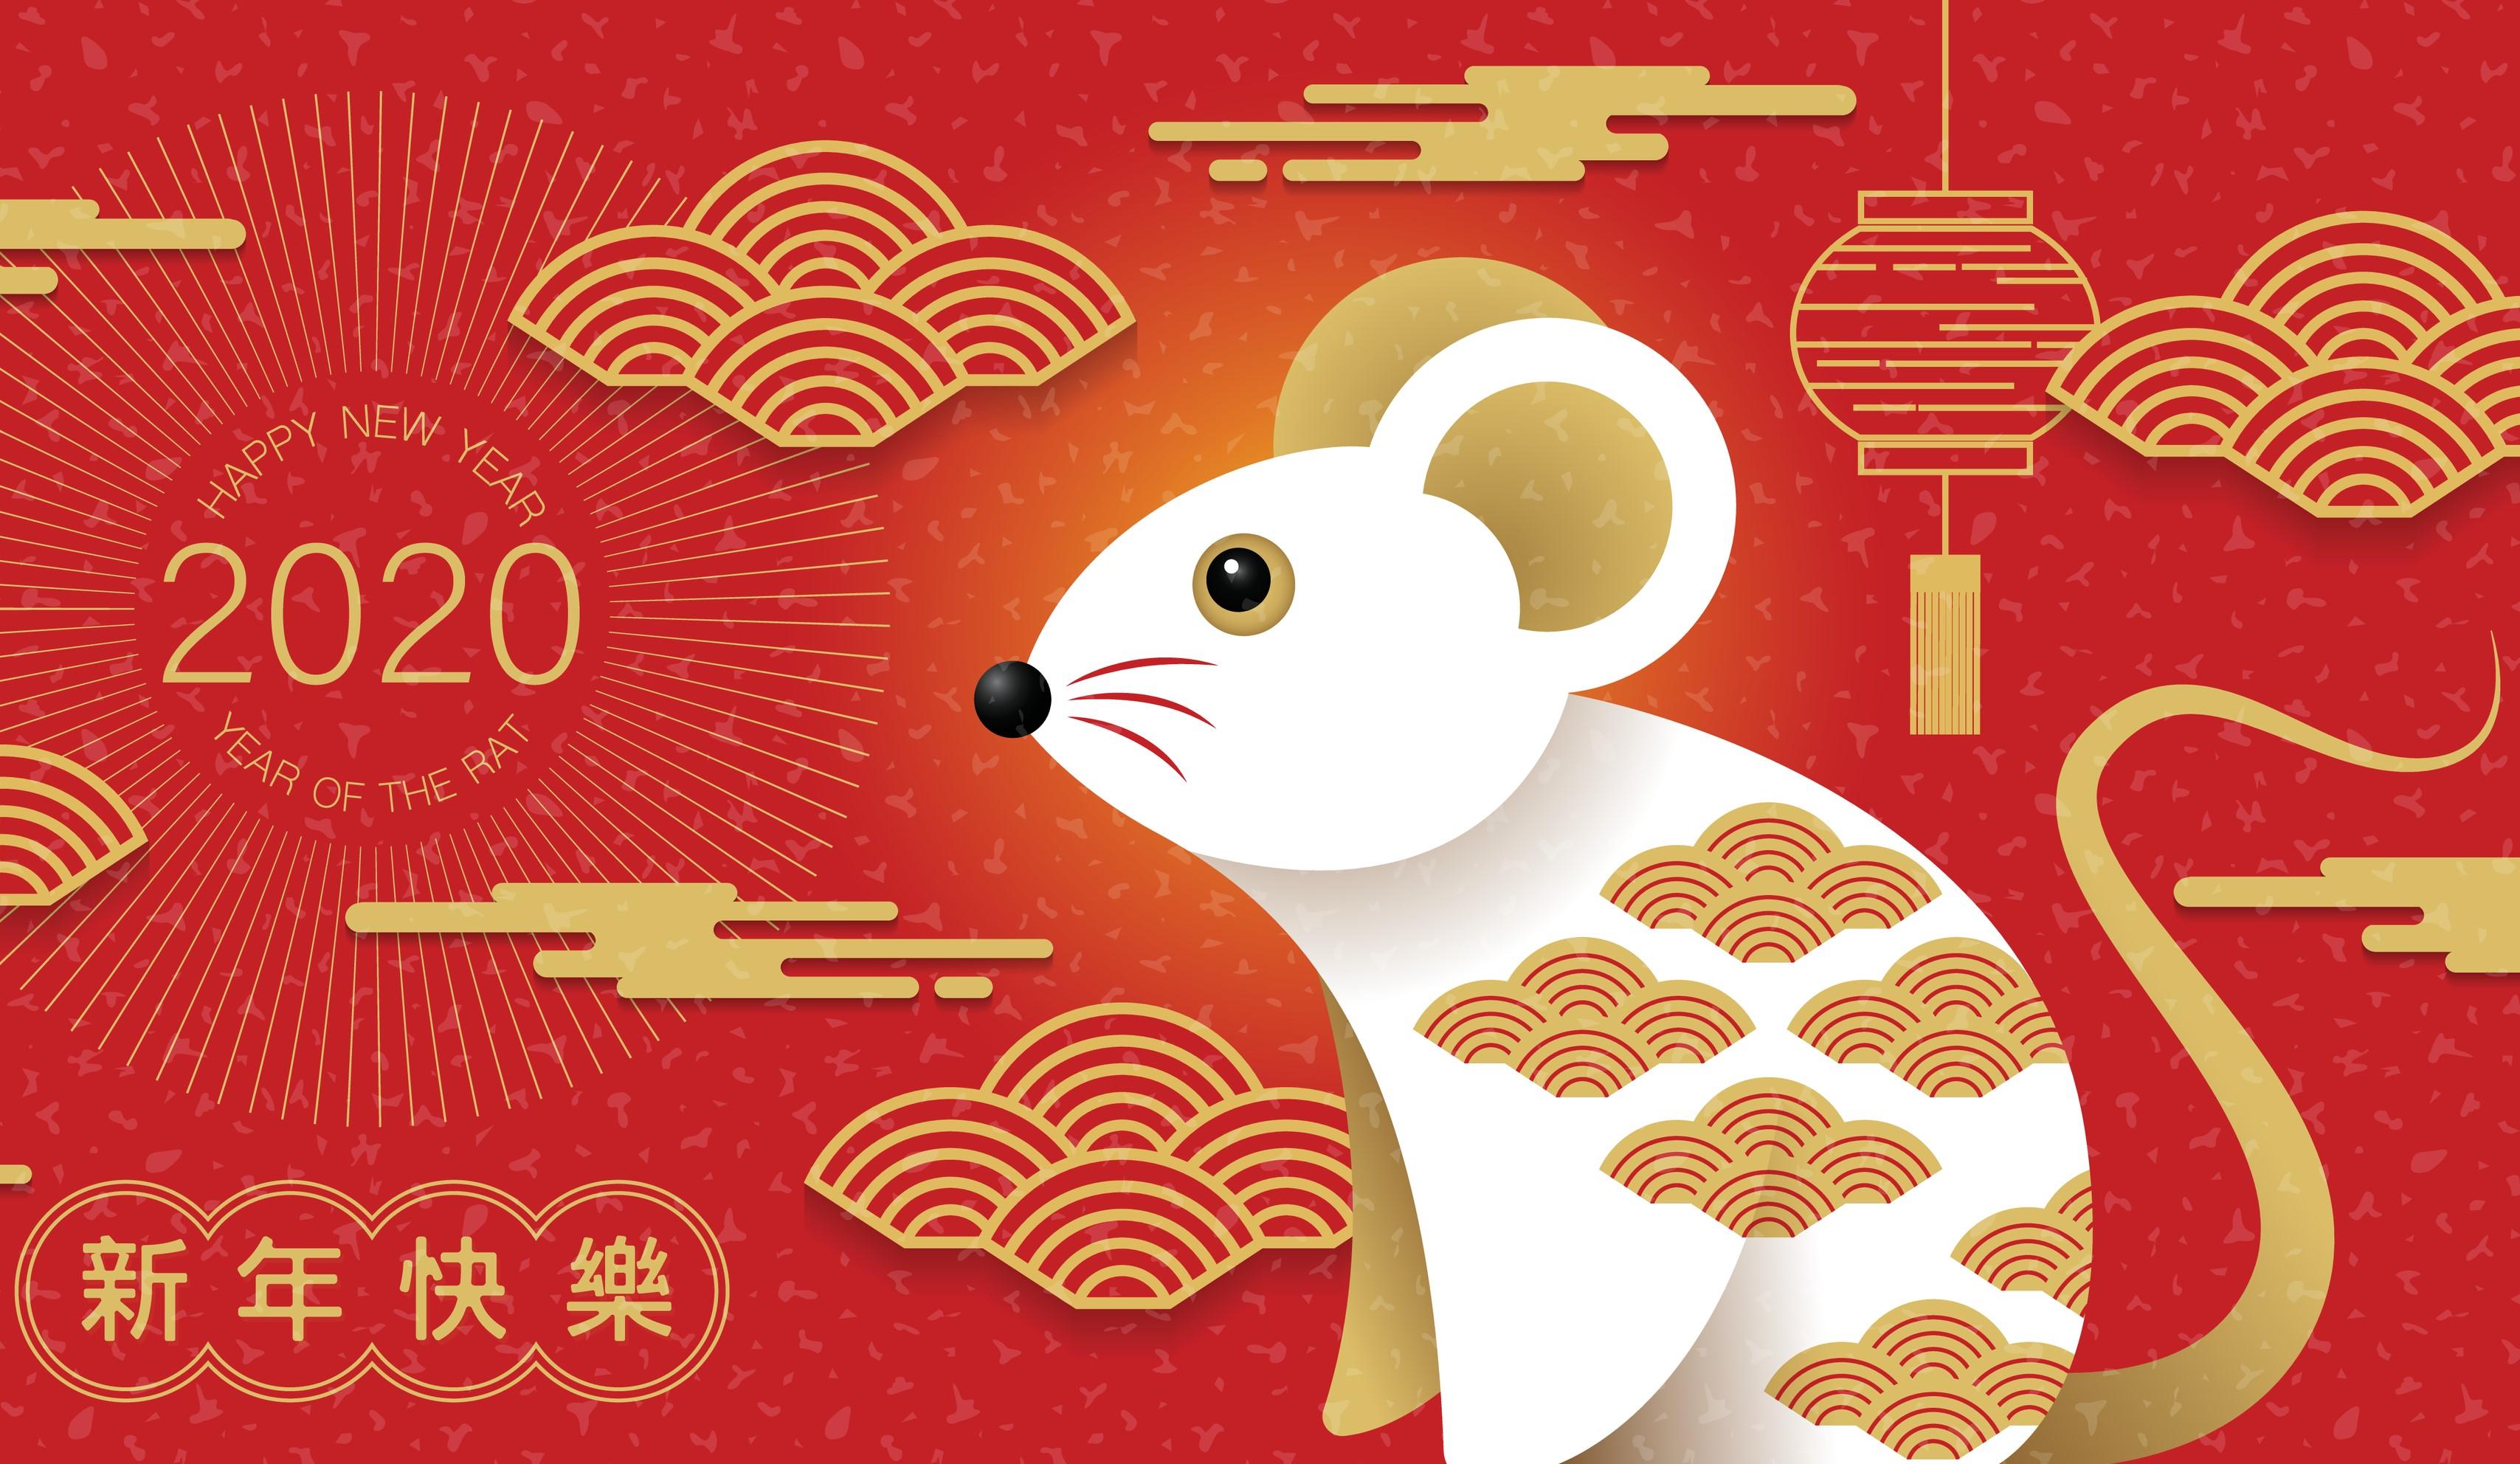 Horoscop chinezesc 2020. Anul Șobolanului de Metal